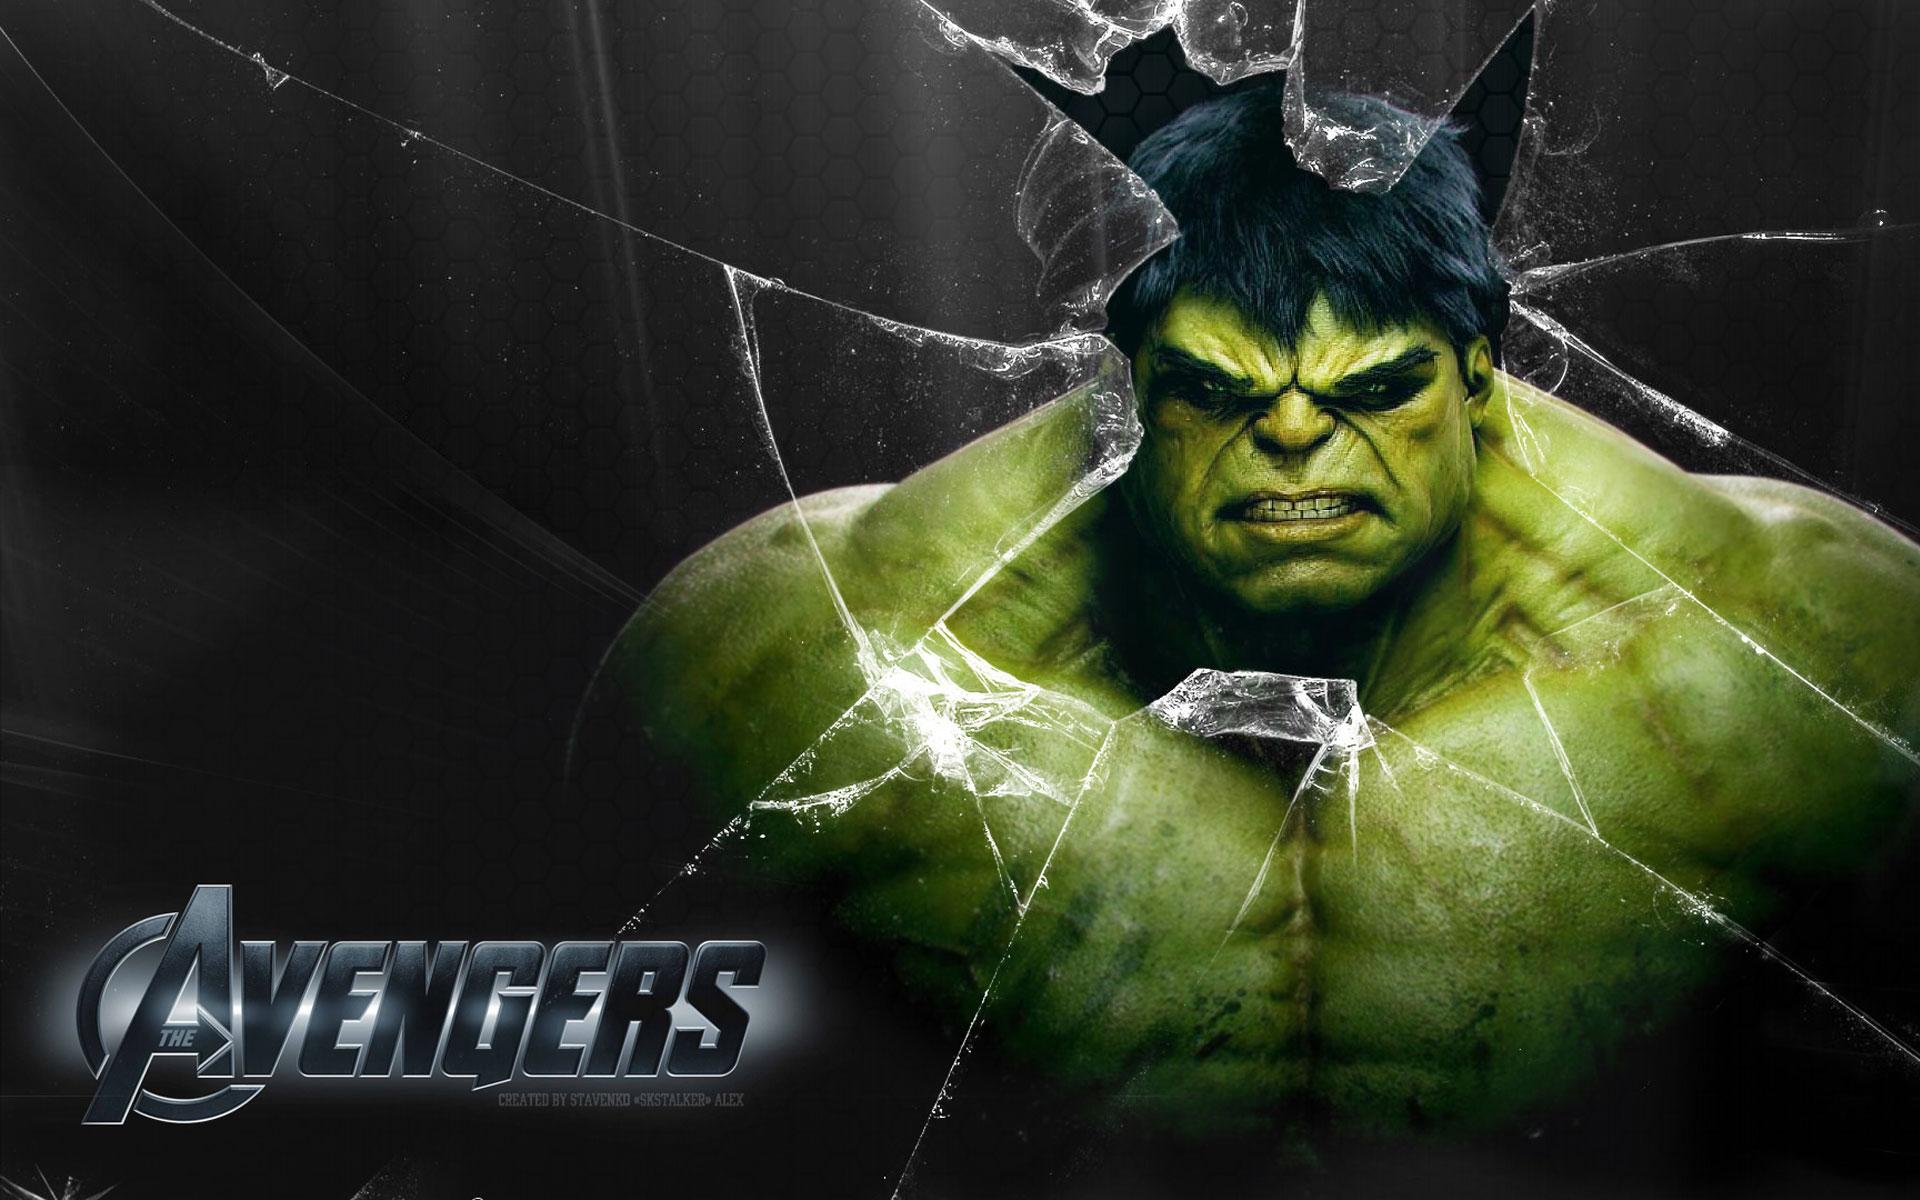 46 Cool Incredible Hulk Iphone Wallpapers On Wallpapersafari